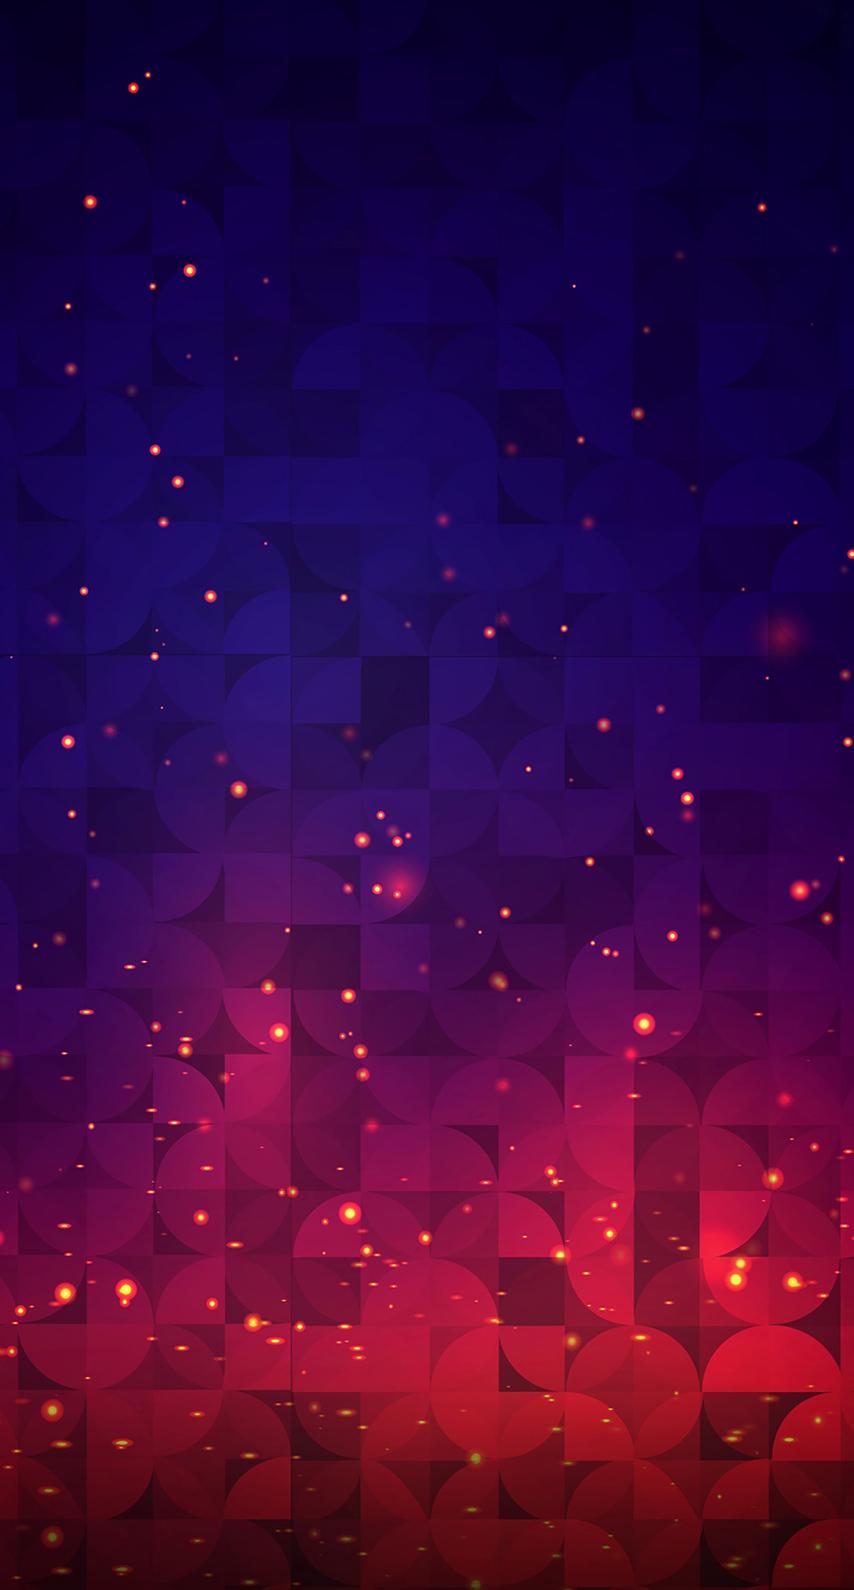 abstract, bright, art, design, insubstantial, wallpaper